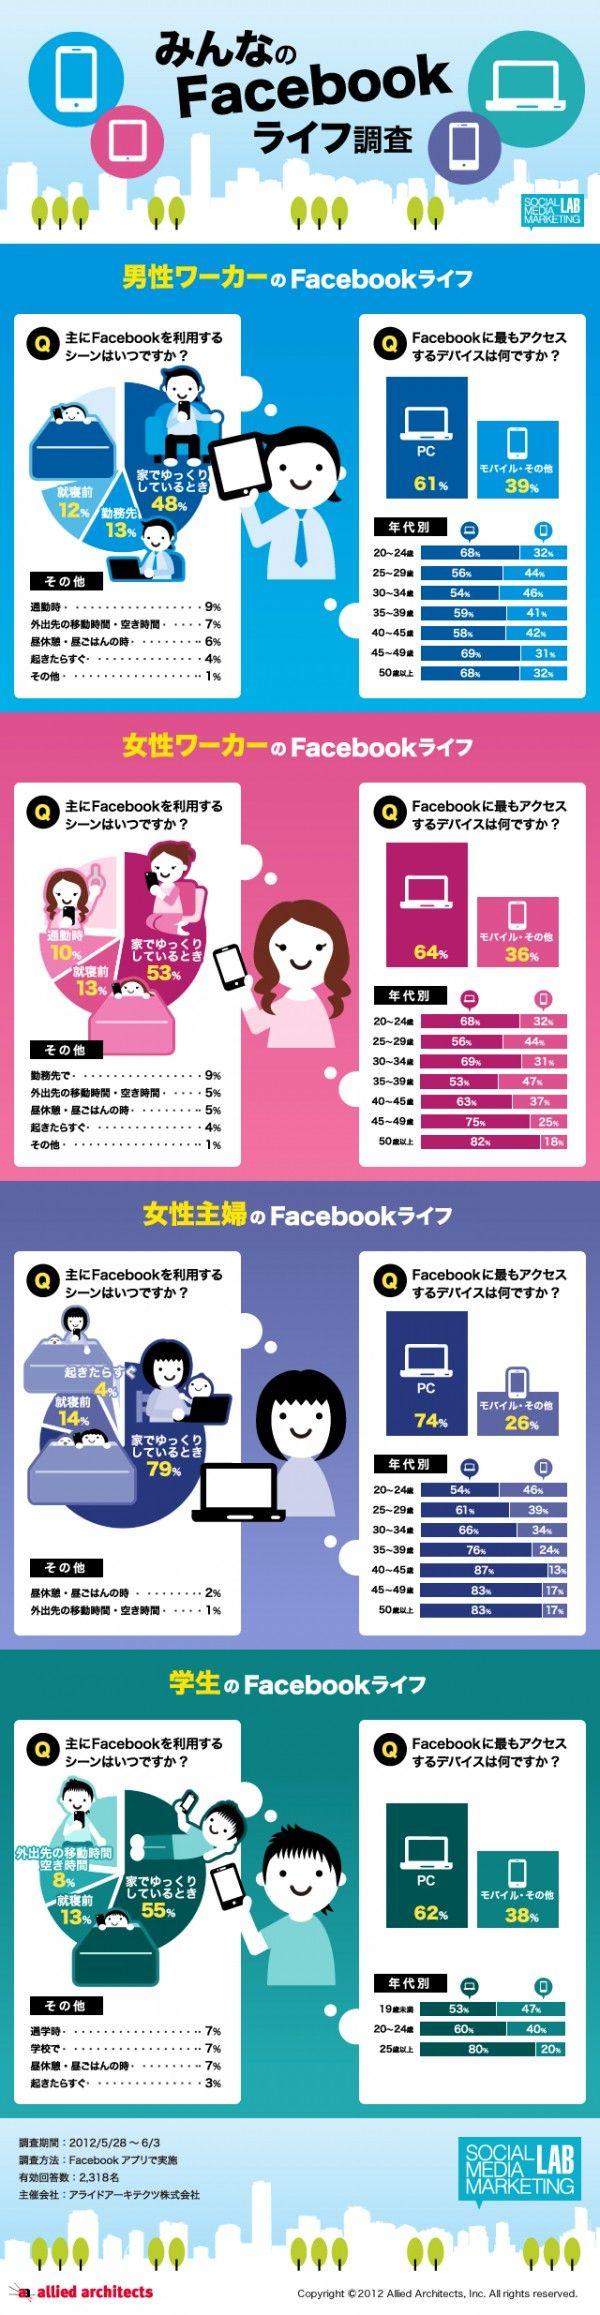 infographics   Facebook user demographic data